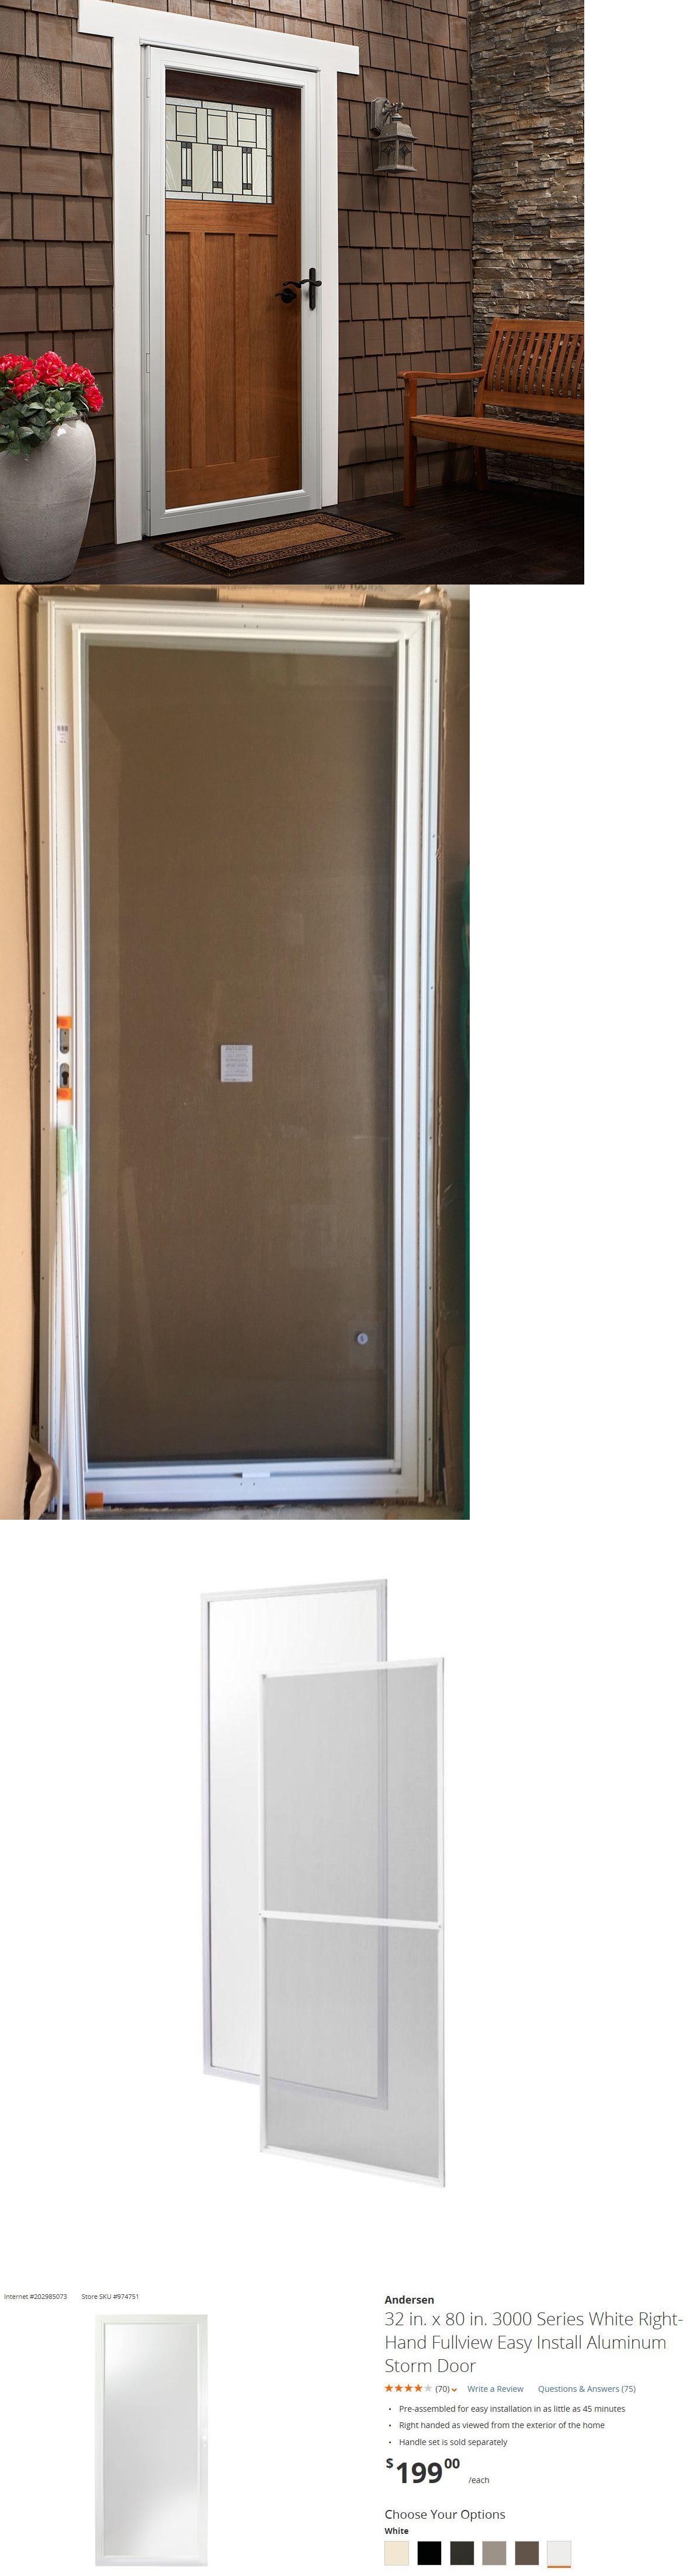 Doors 85892 Andersen 3000 Right Fullview Easy Install Aluminum